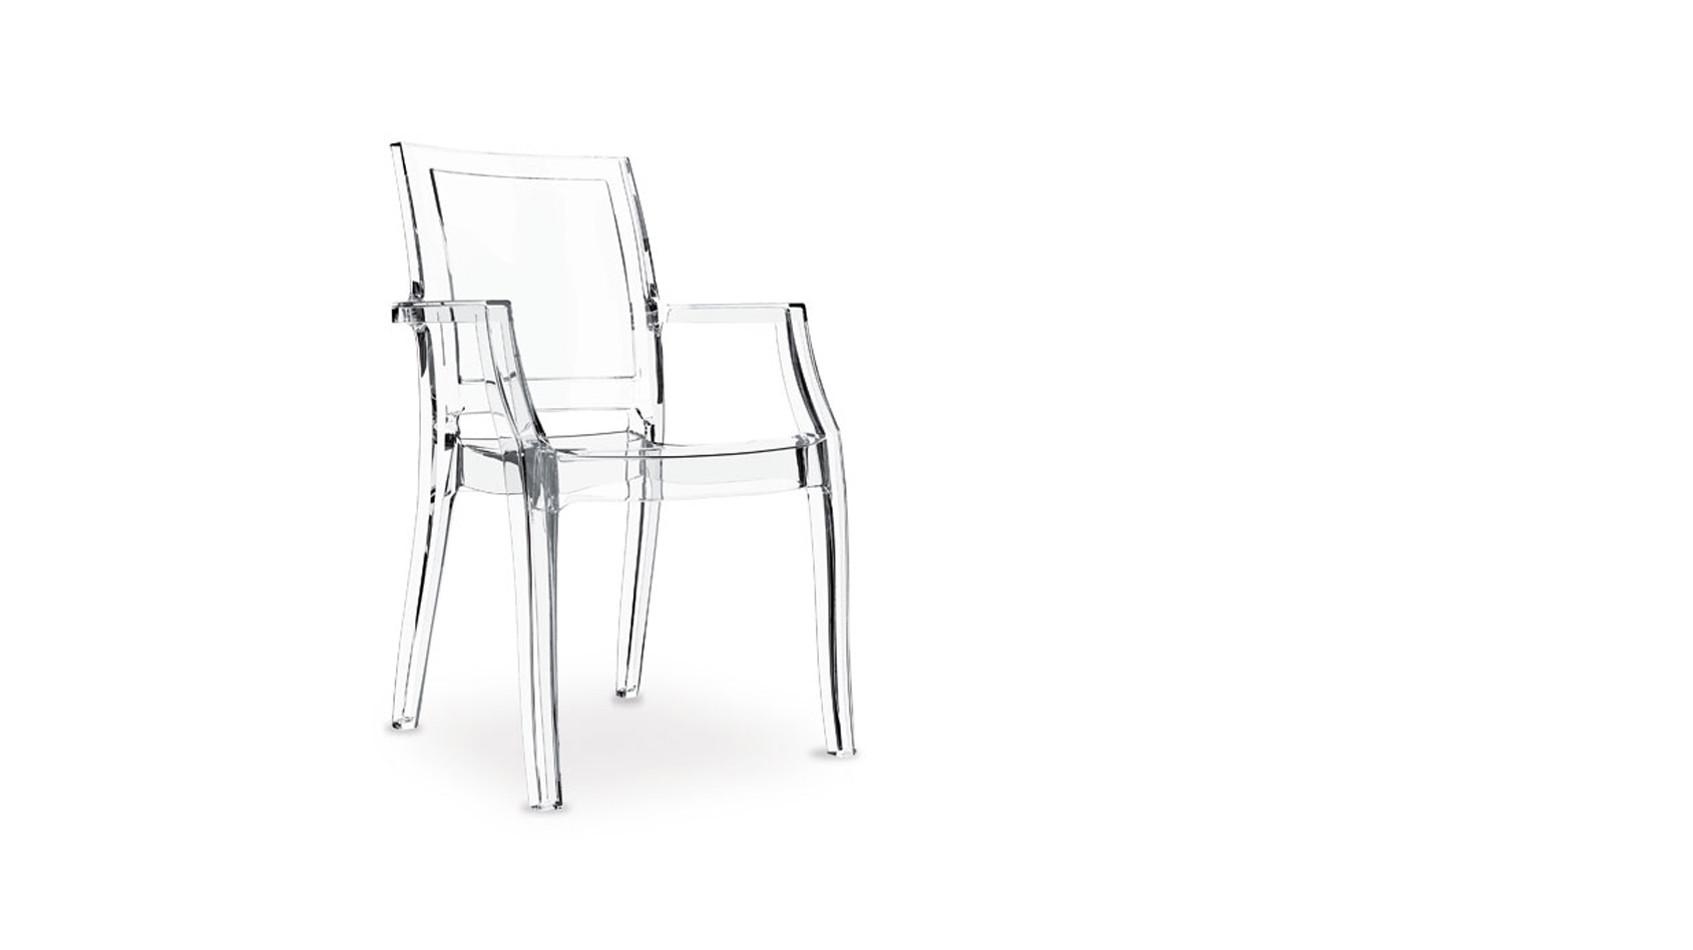 Ghost Plexiglas Acryl Polycarbonat Armlehnstuhl, in transparent Schwarz oder Honig bestellbar.